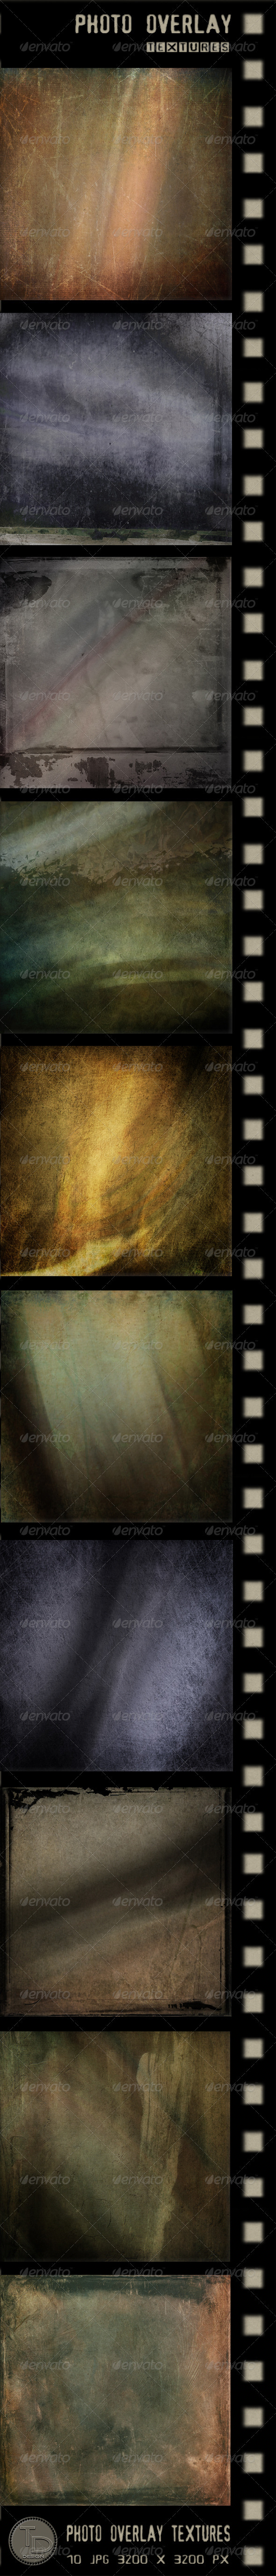 GraphicRiver Photo Overlay Textures 2580031